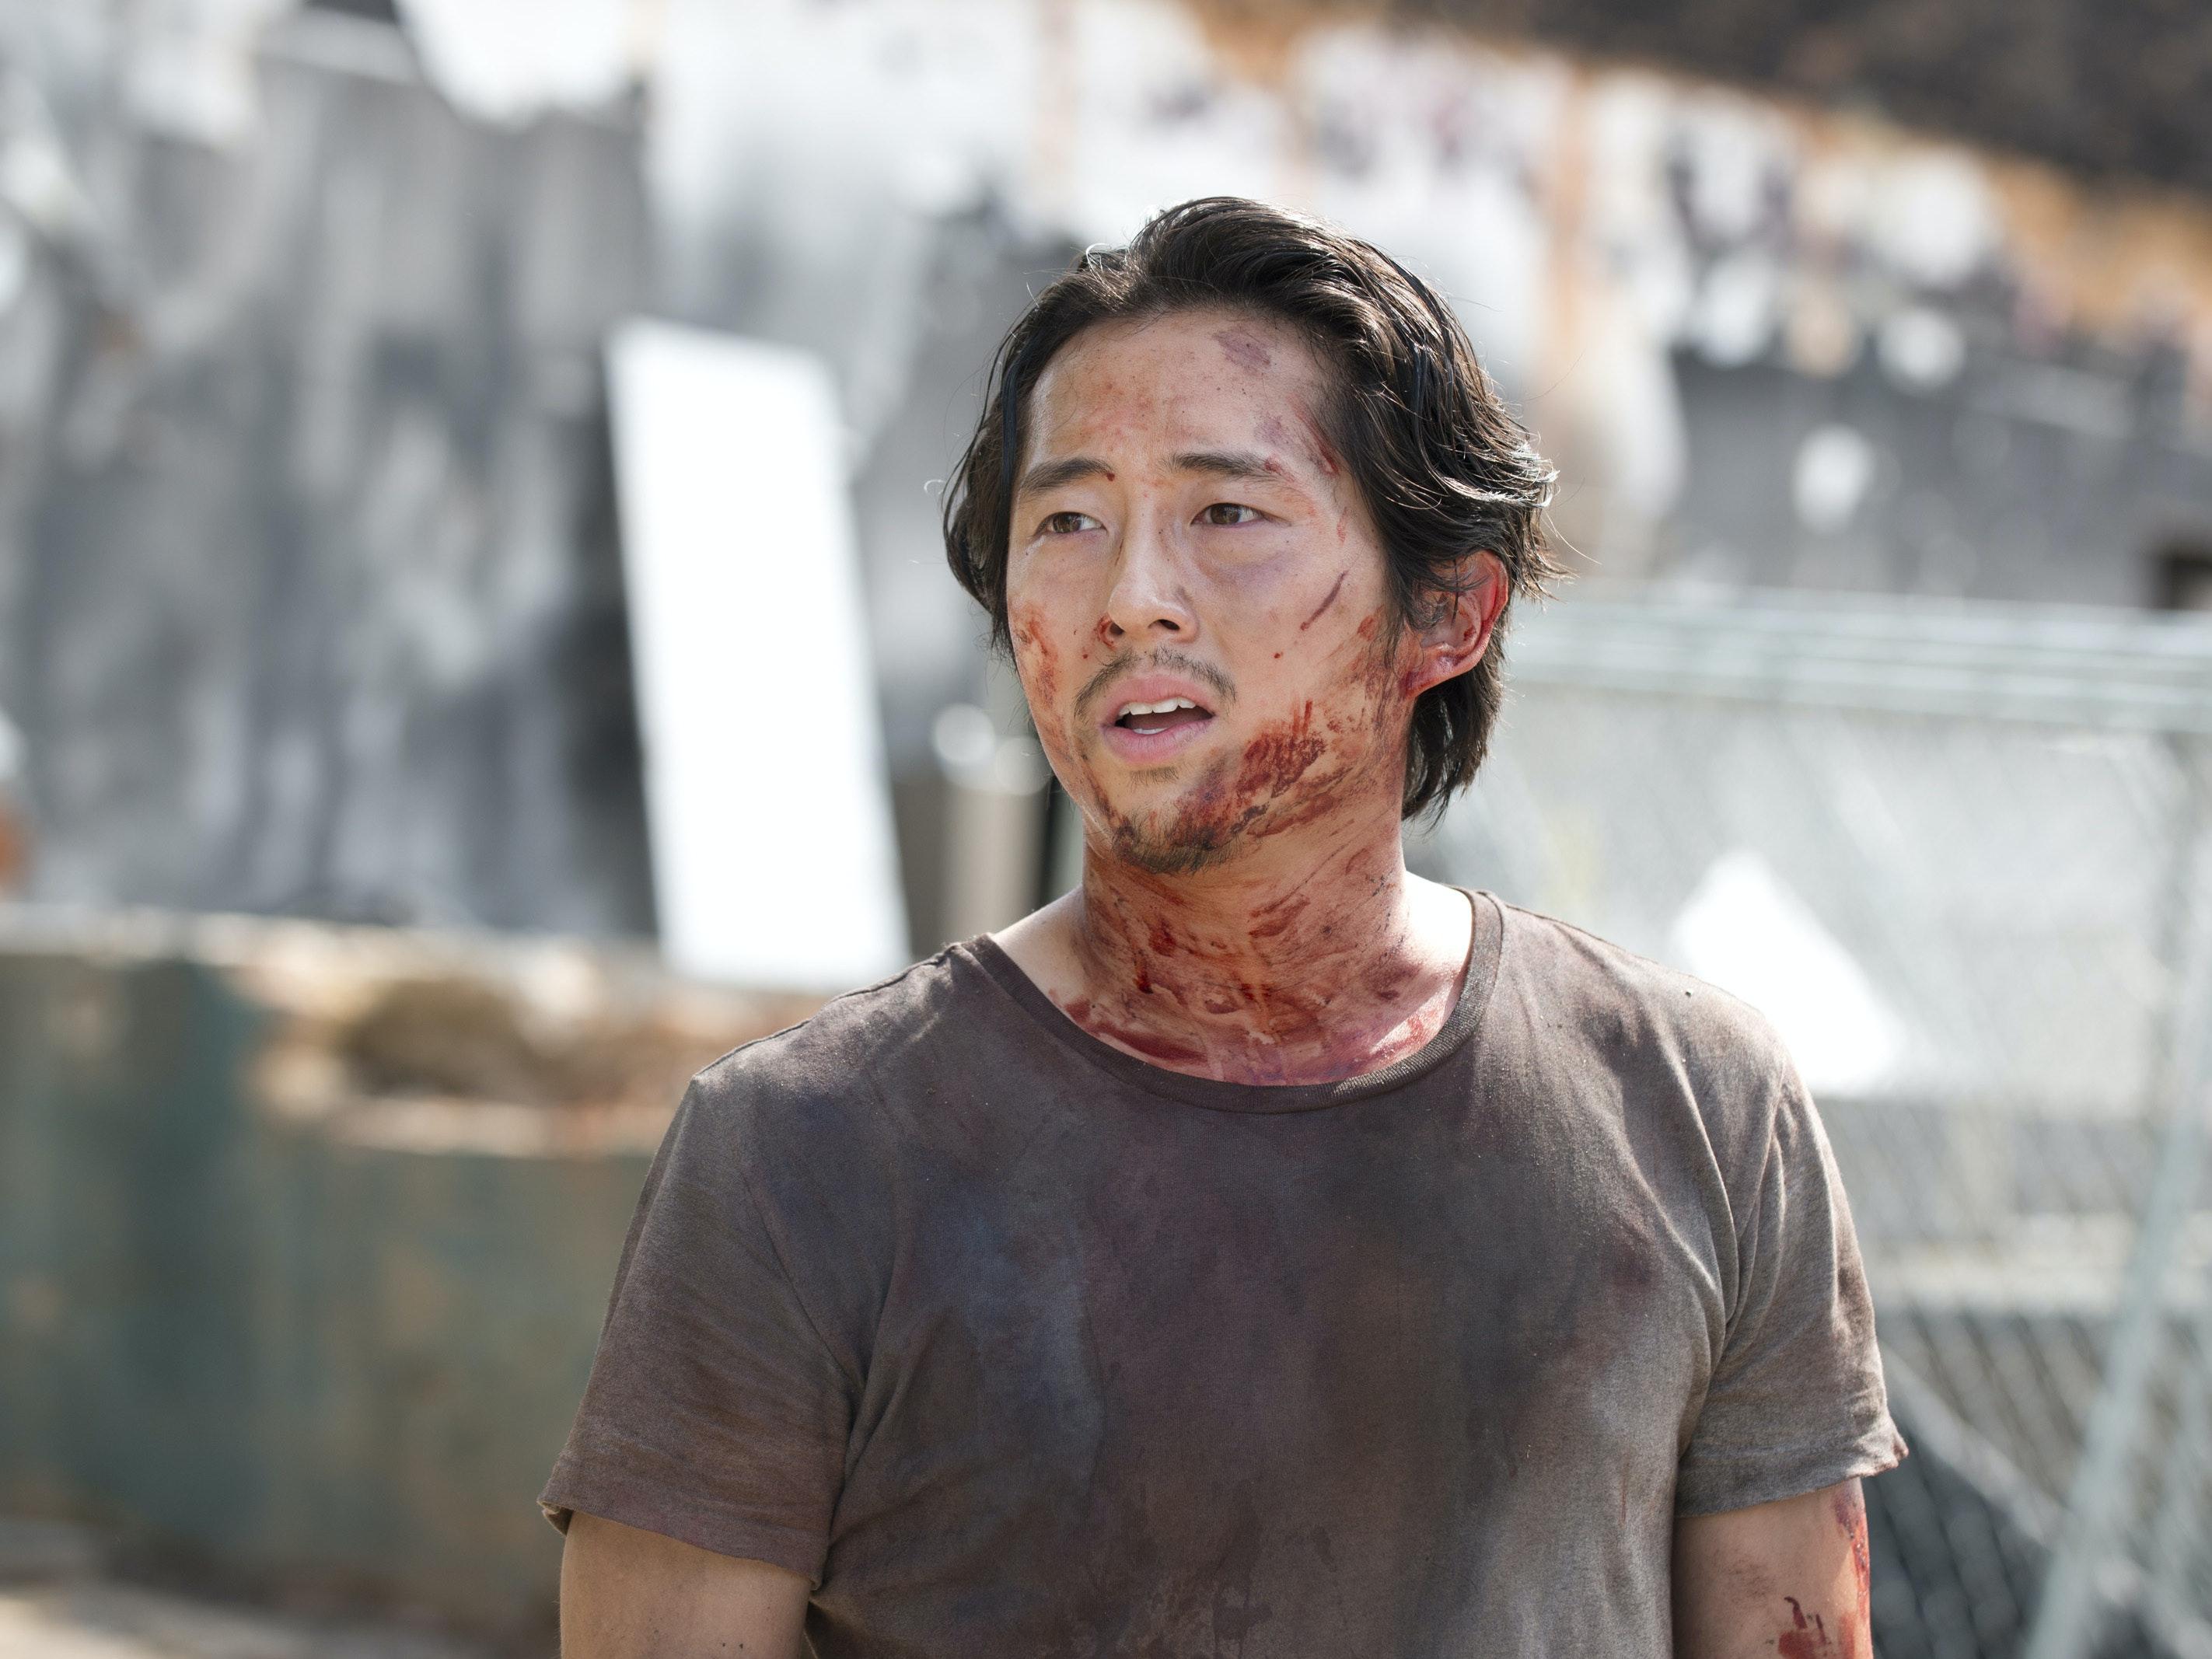 Steven Yeun Knew a Year Ago Negan Would Kill Glenn This Season